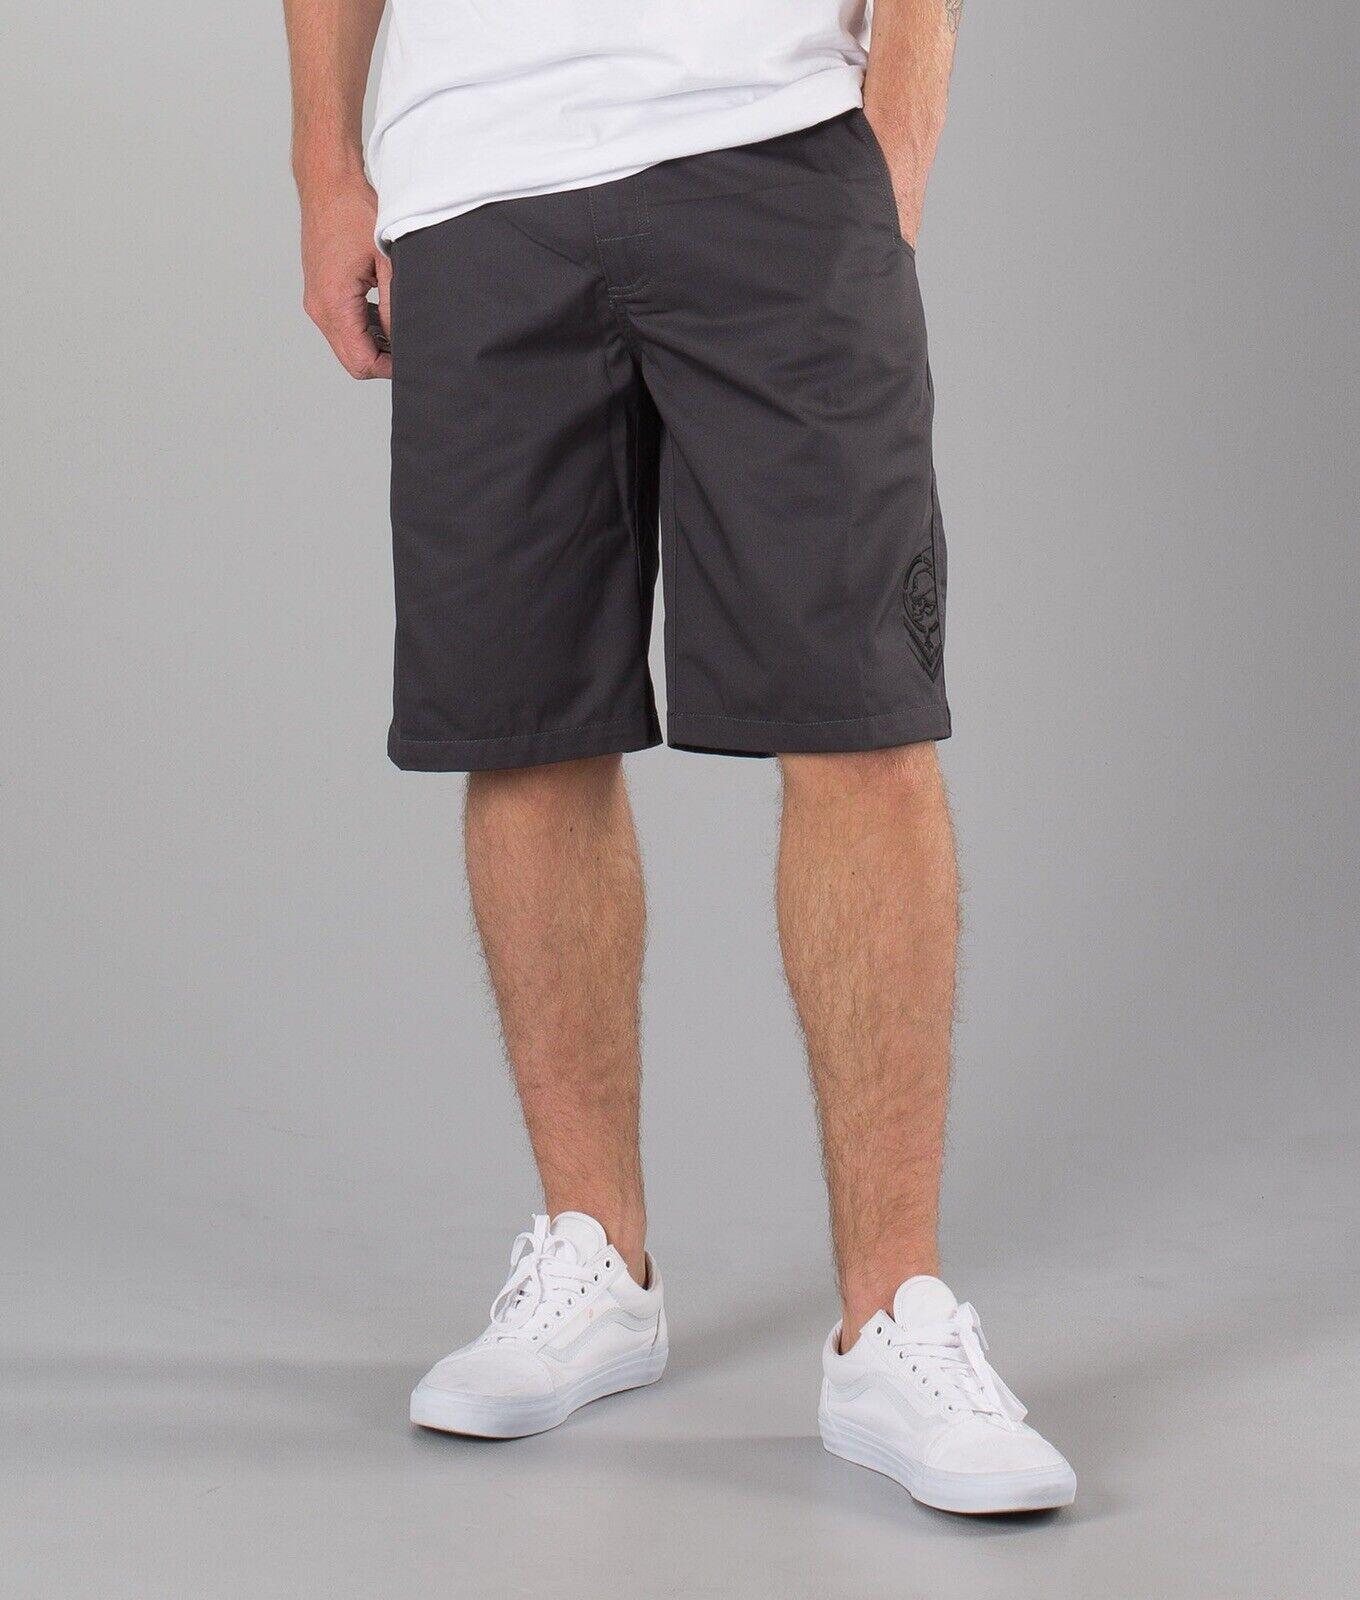 Metal Mulisha Men's Ocotillo Short Walkshort Size 31